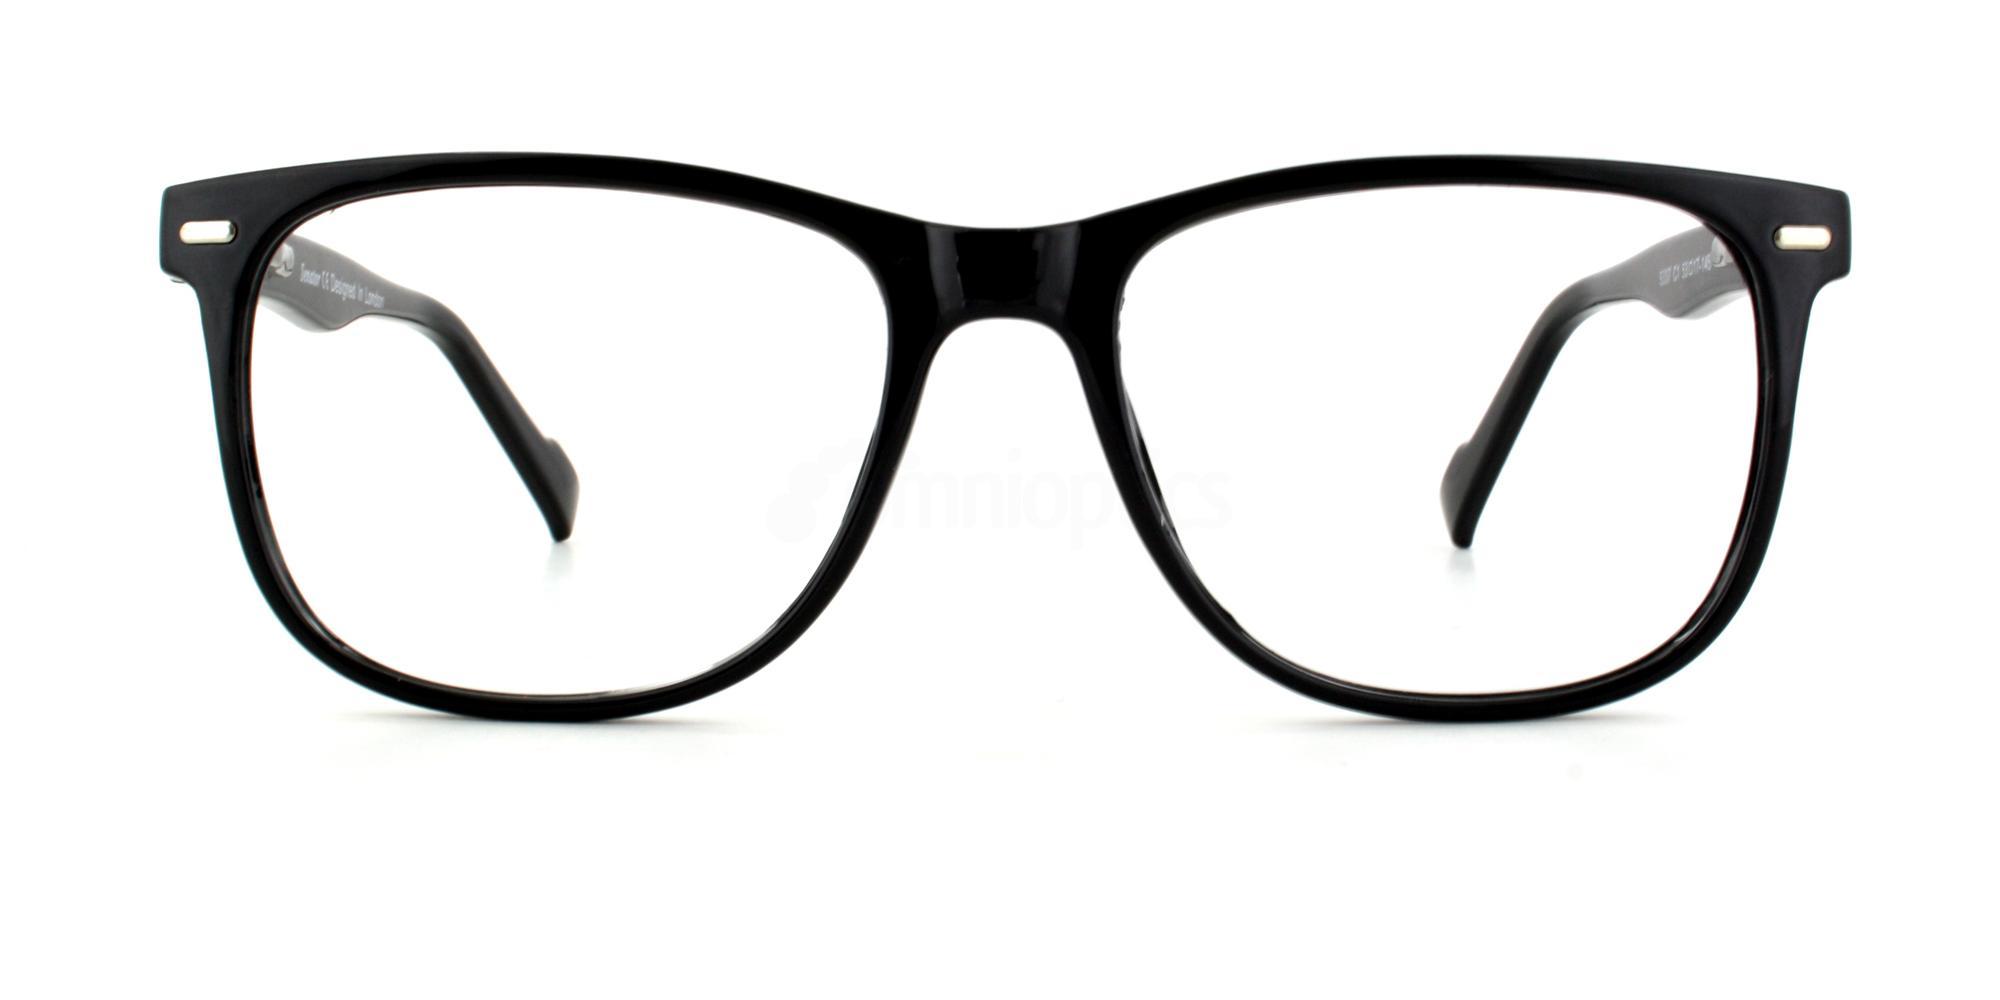 C1 SENATOR 337 Glasses, Senator